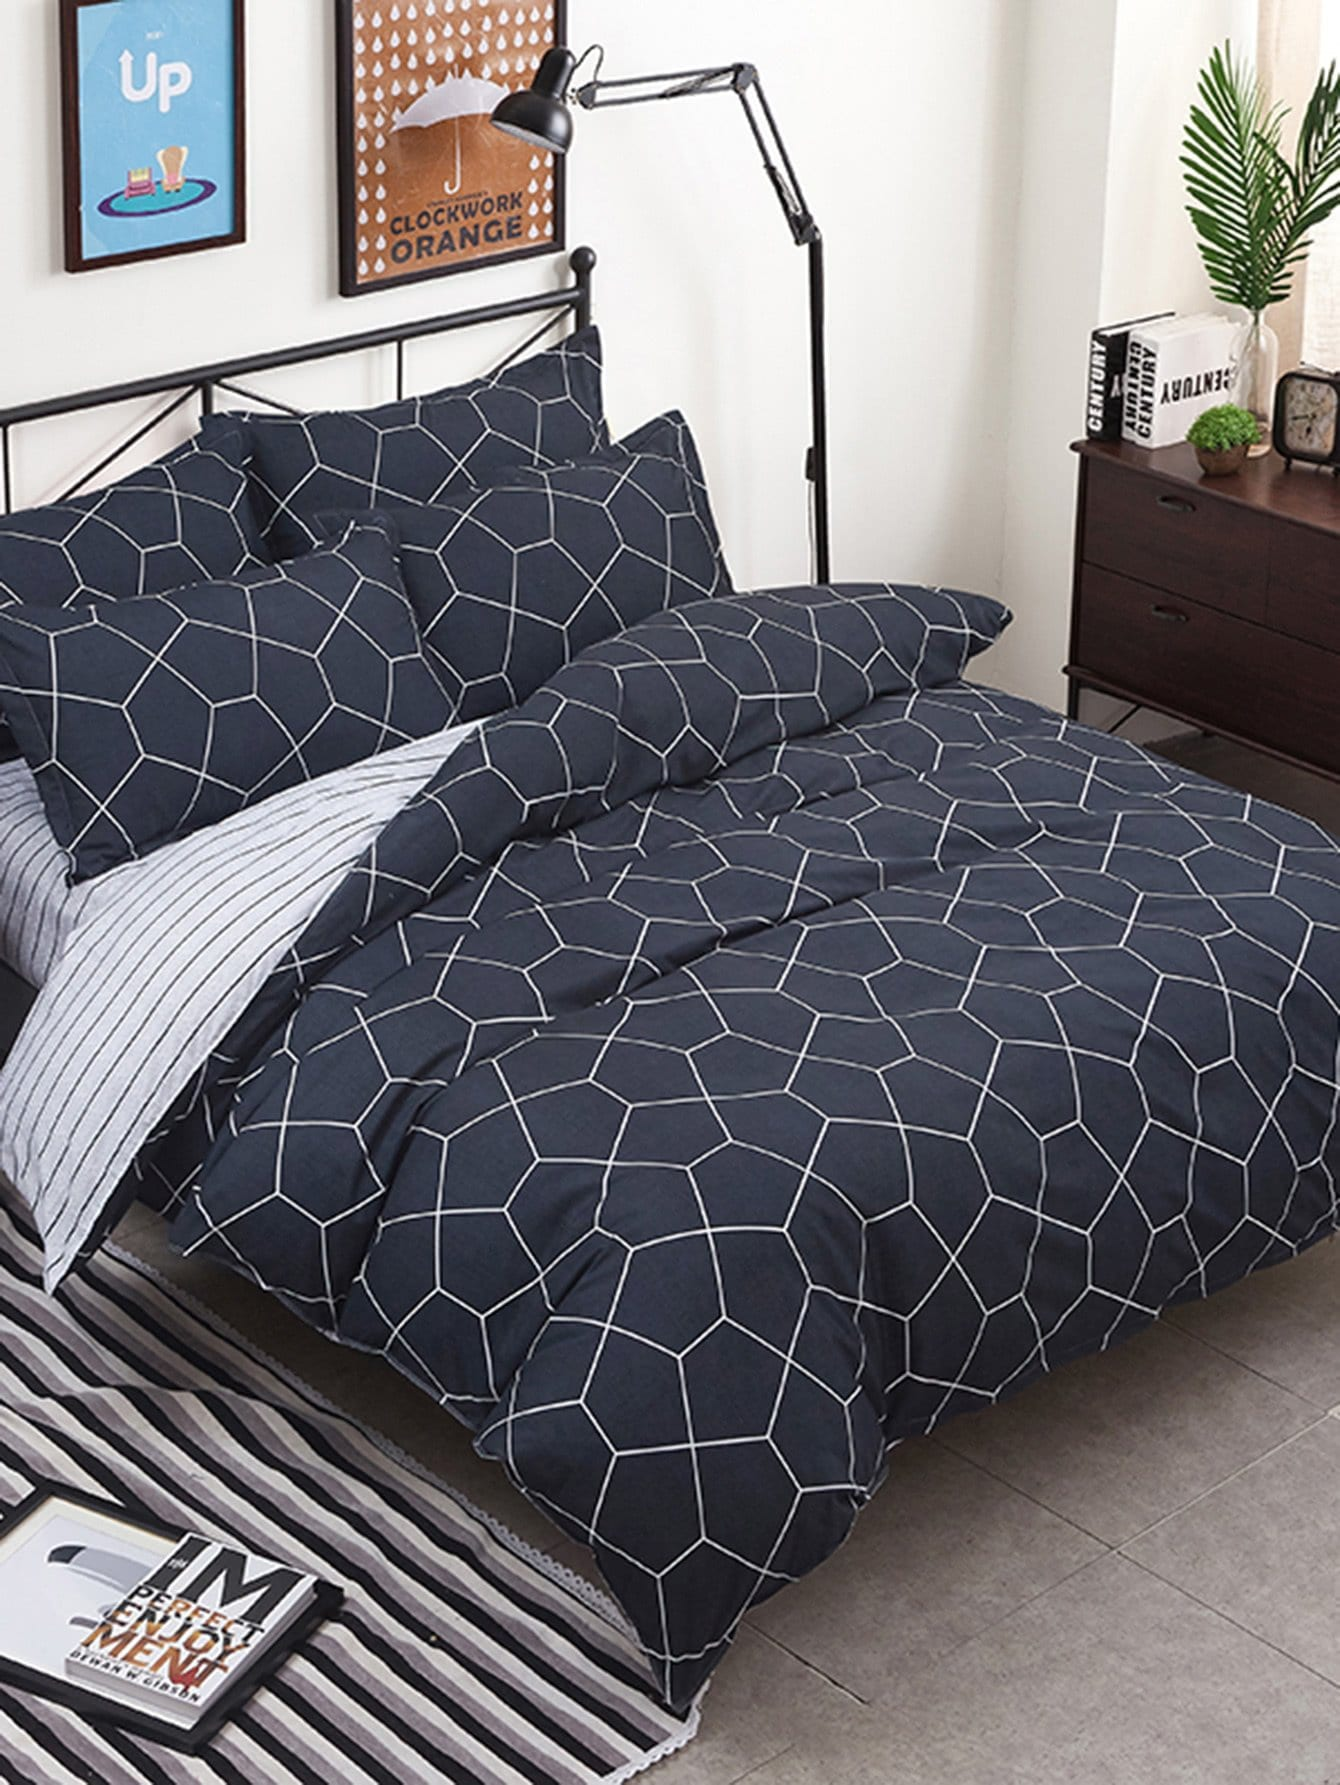 Geometric Pattern Duvet Cover & Sheet & Sham Set